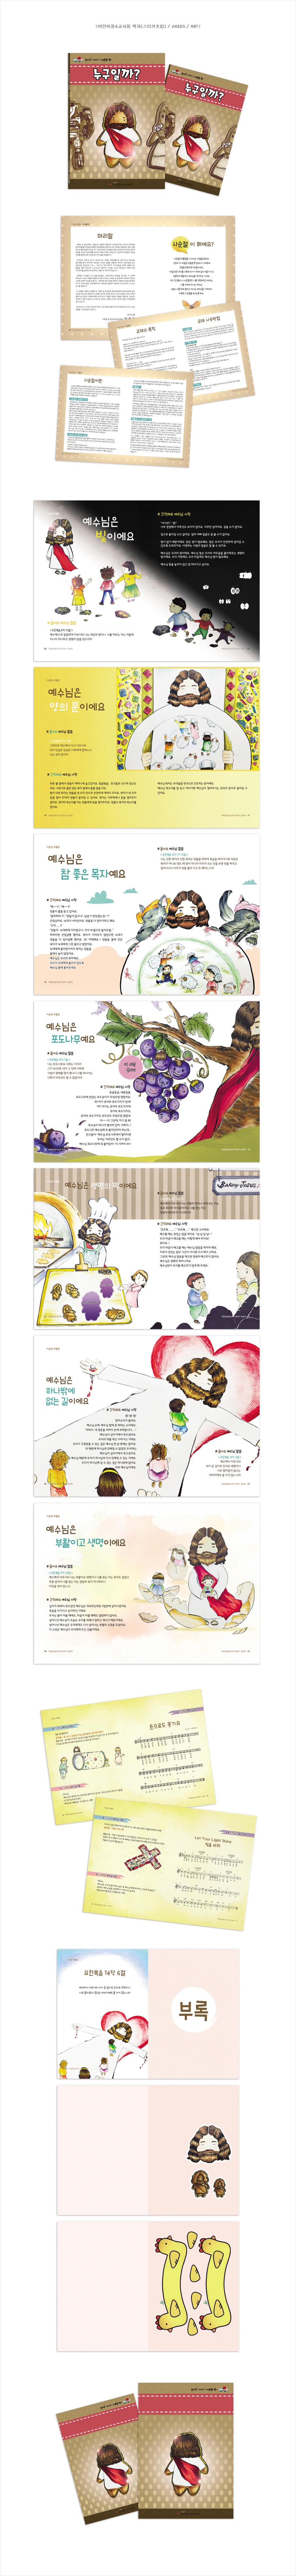 ks_book01.jpg